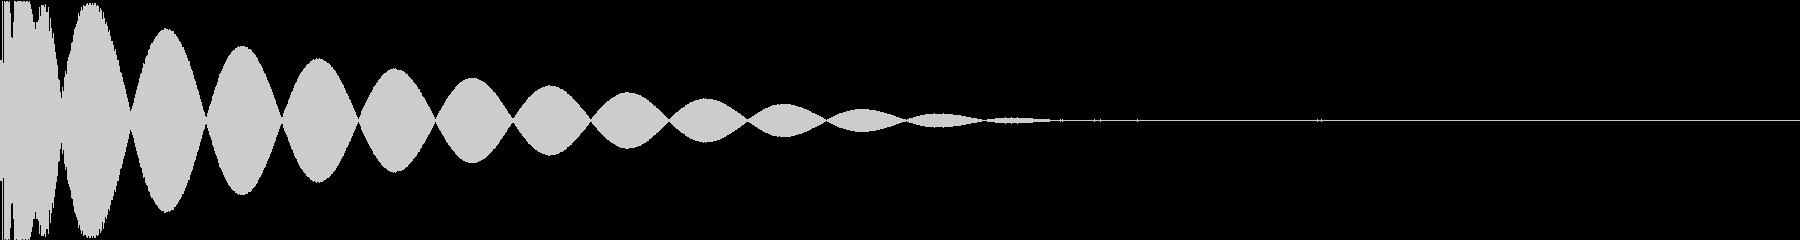 DTM Kick 88 オリジナル音源の未再生の波形